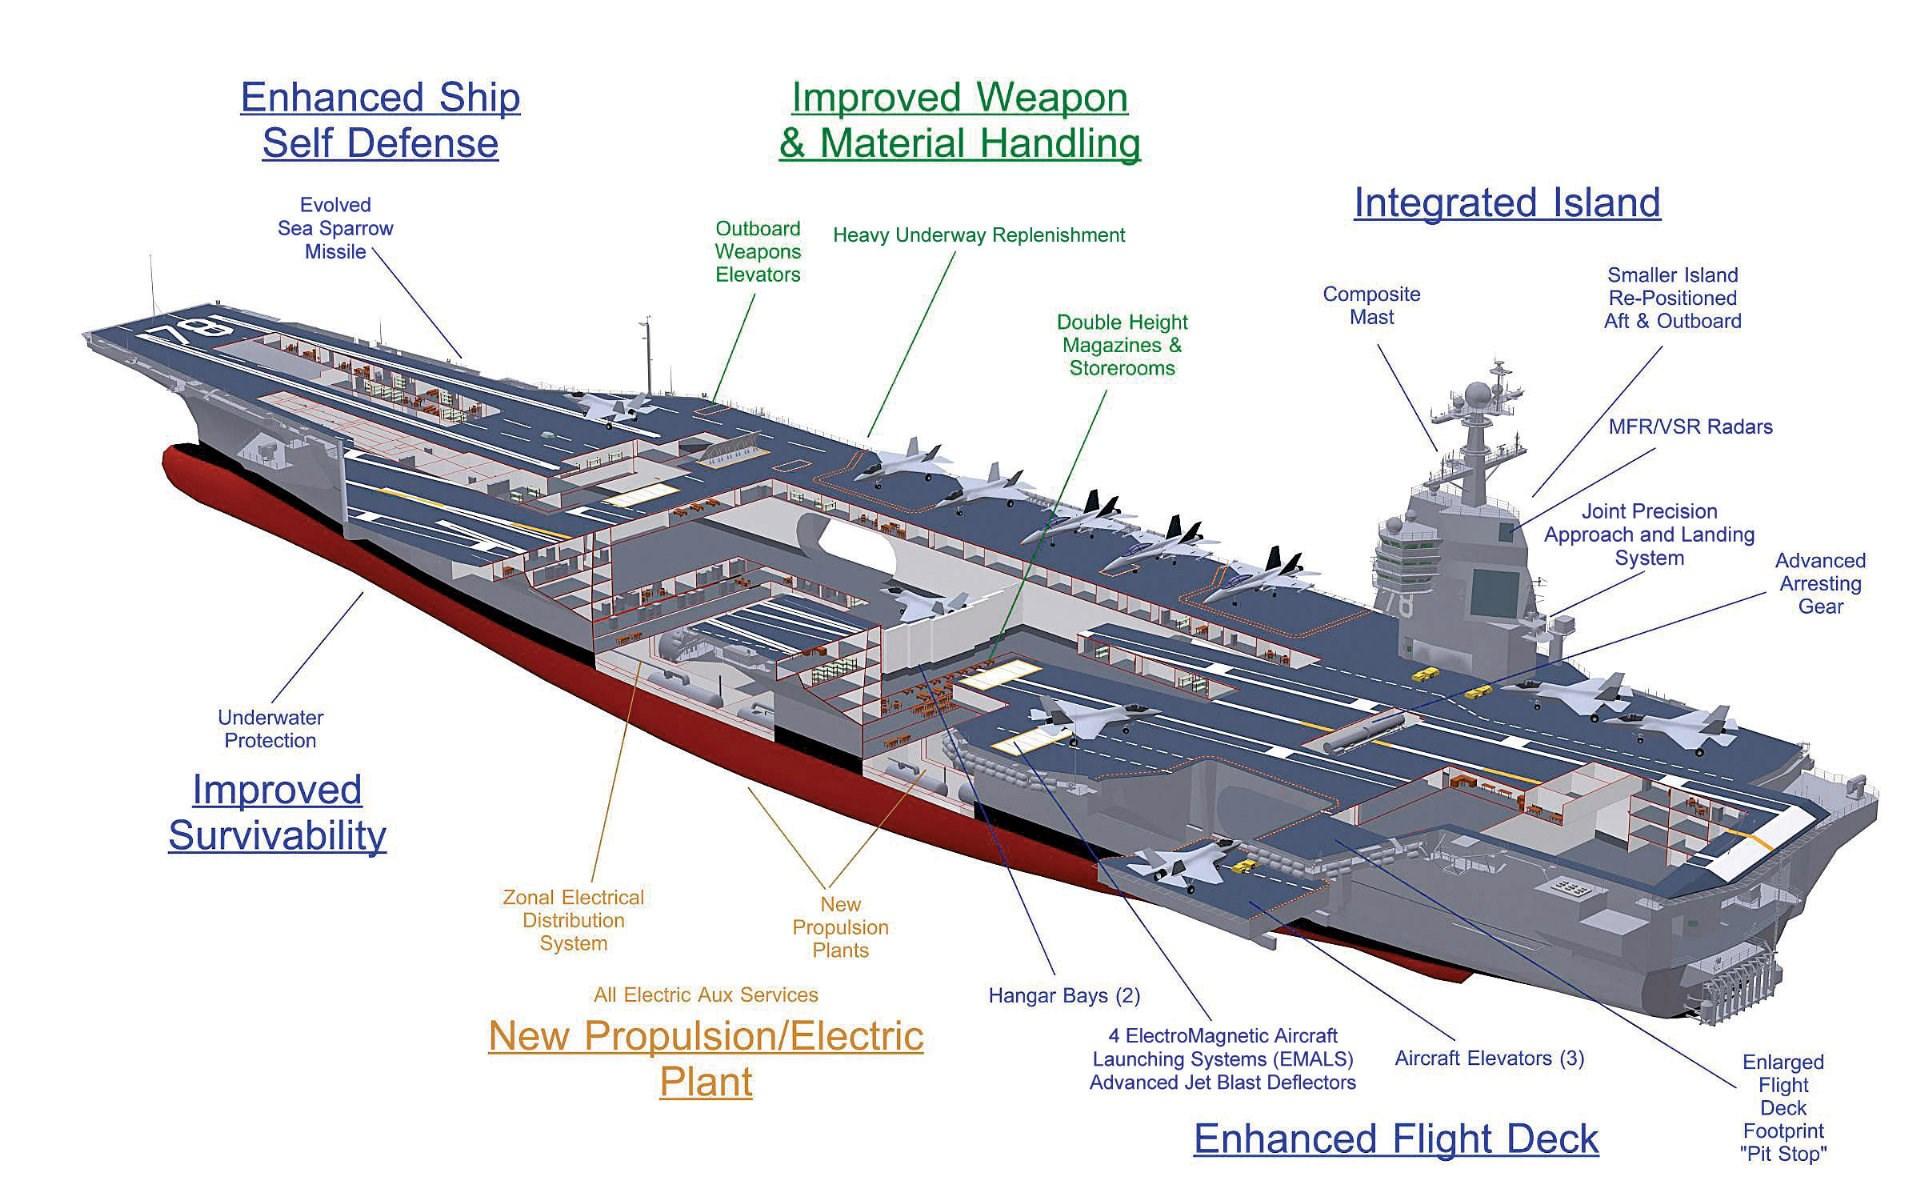 united-states-navy-desktop-nexus-wallpaper-wp38011513